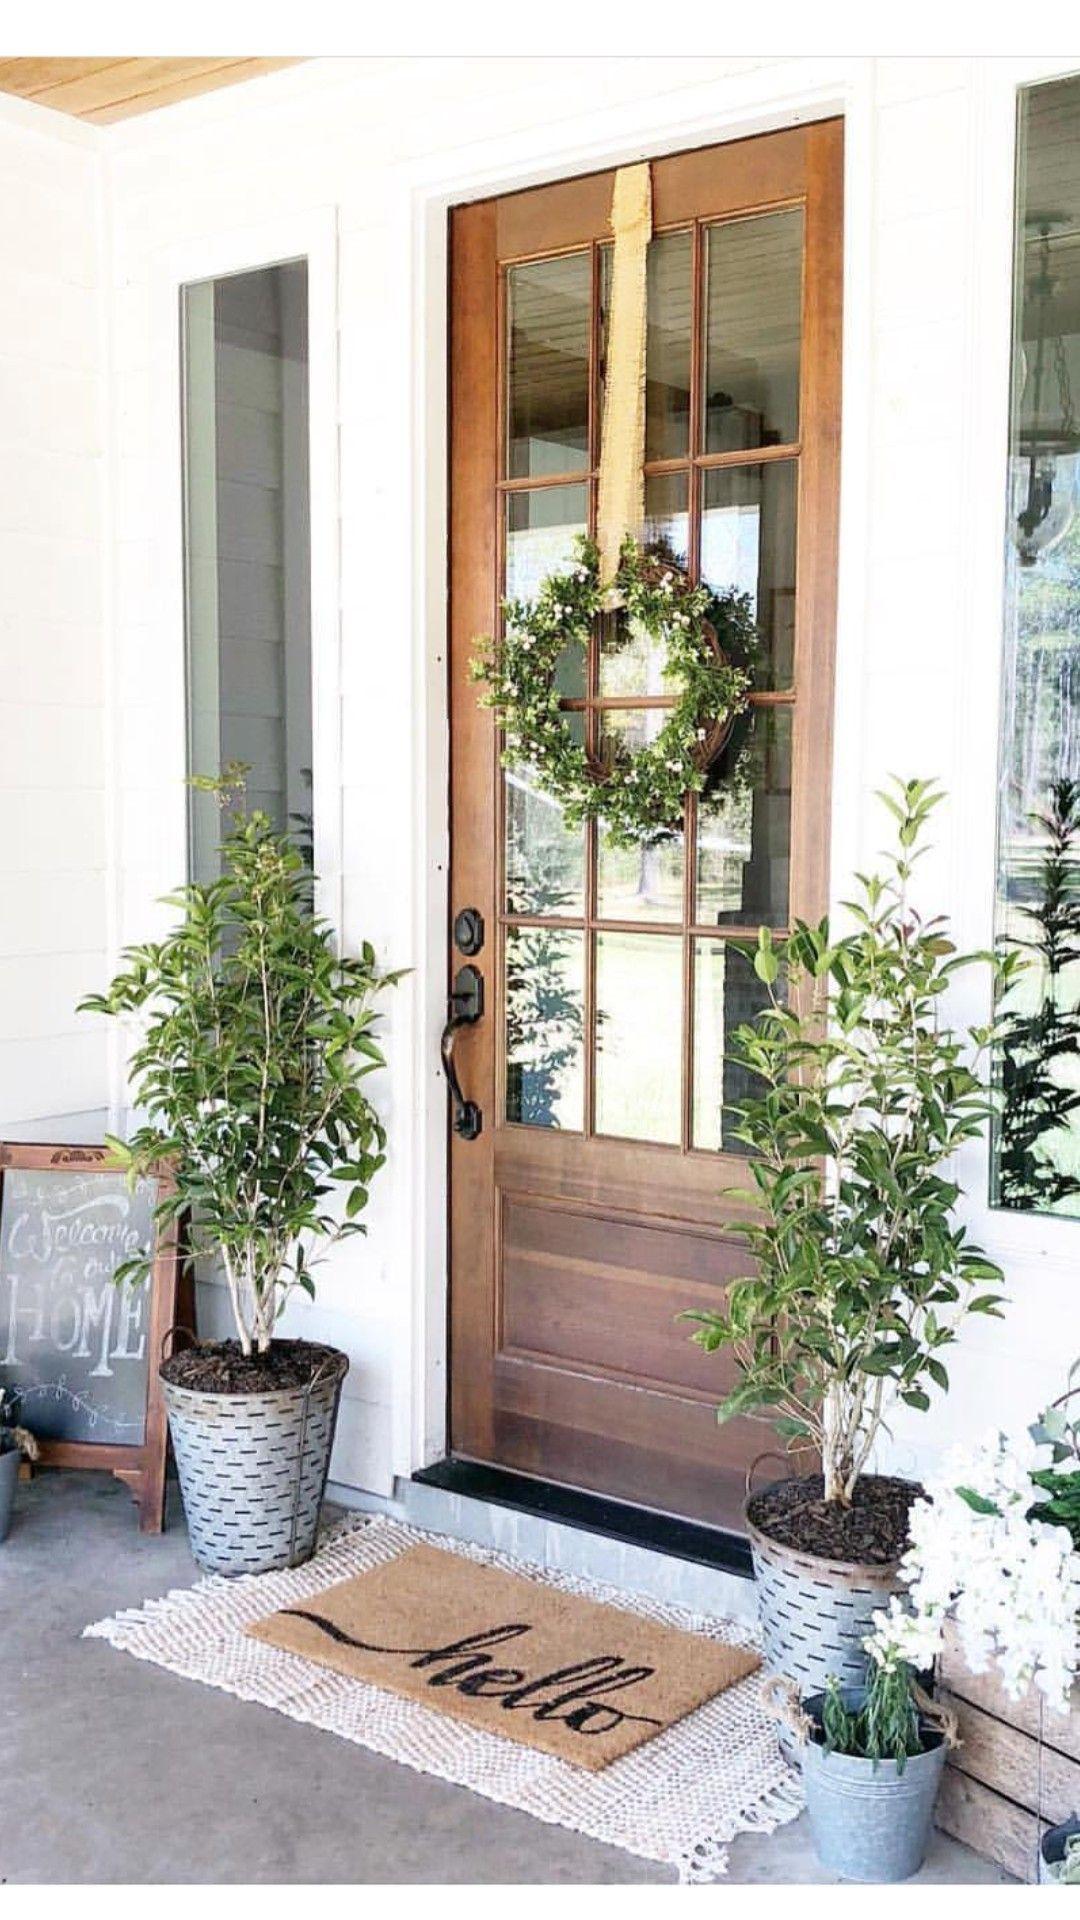 47 Fancy Farmhouse Fall Porch Decor And Design Ideas